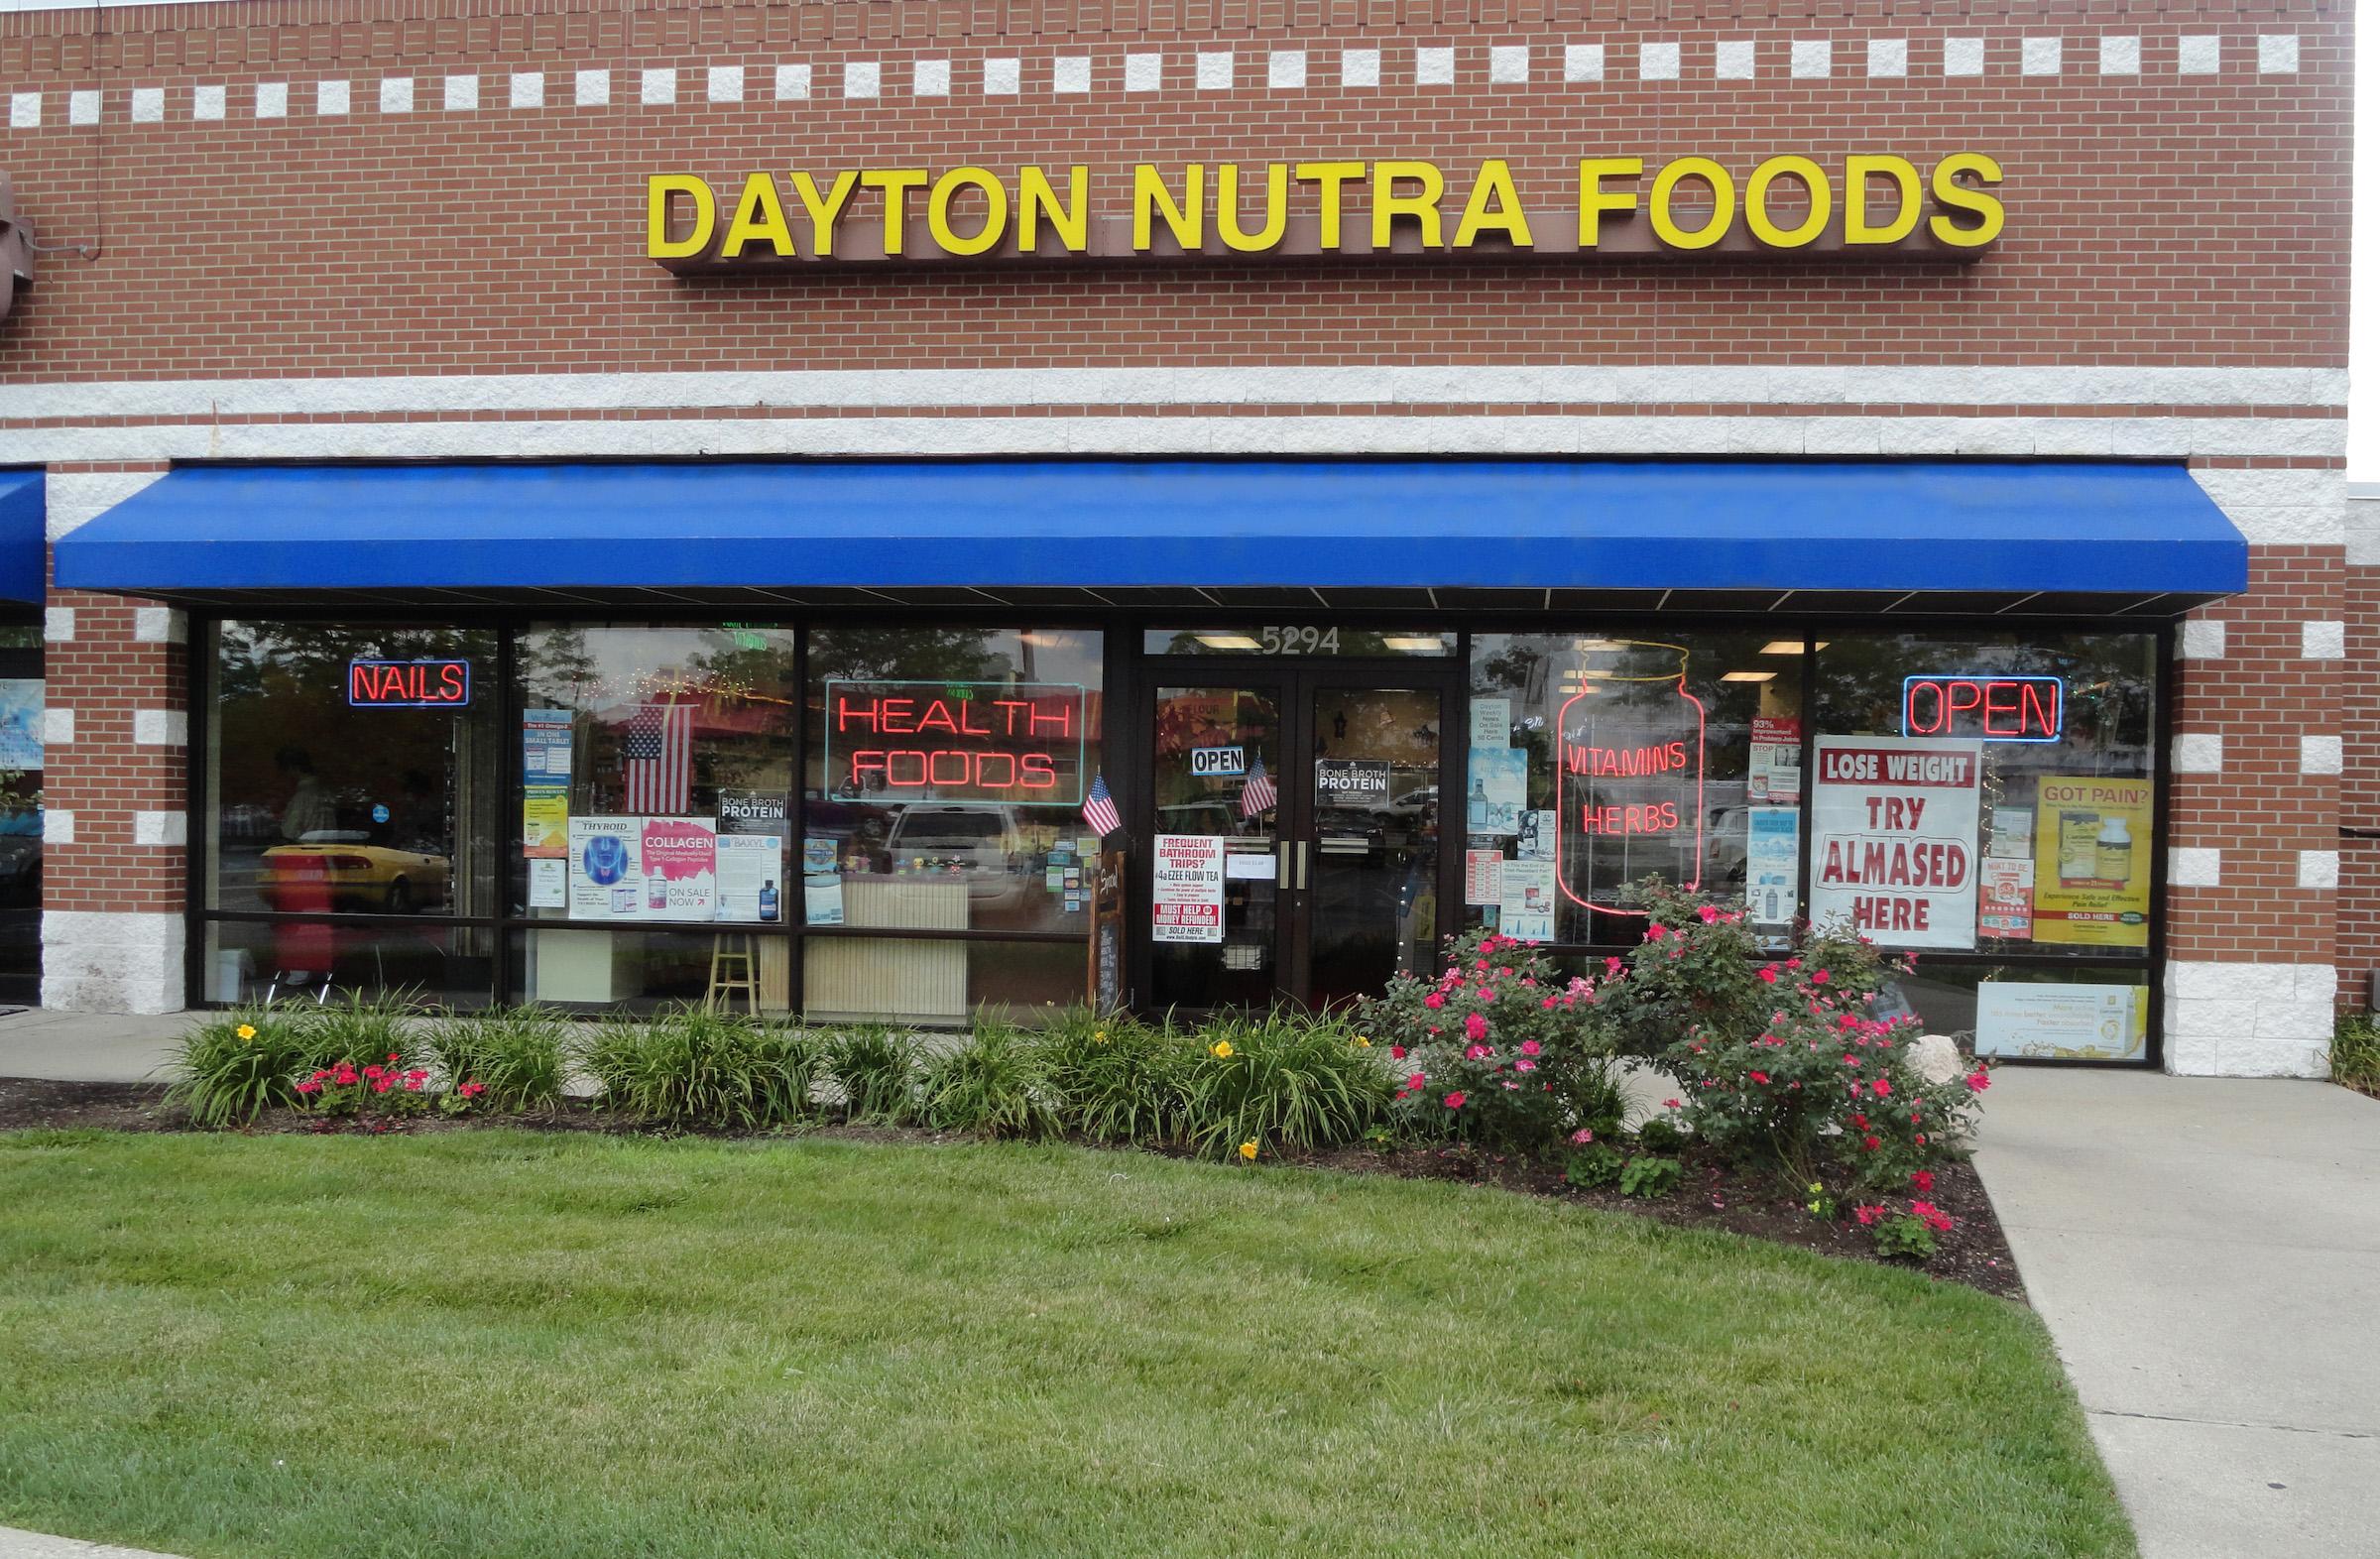 Health Food Store | Dayton Nutra Foods in Dayton, Ohio